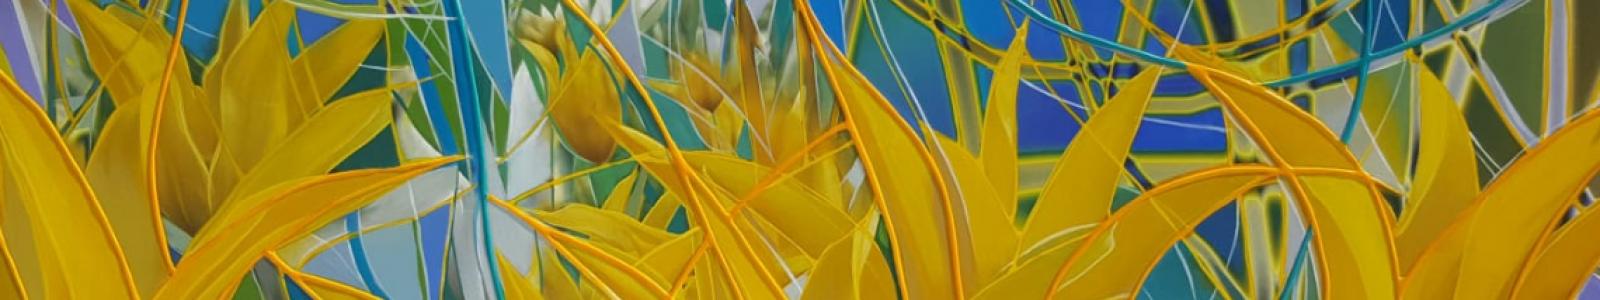 Gallery Painter Lori Blaja